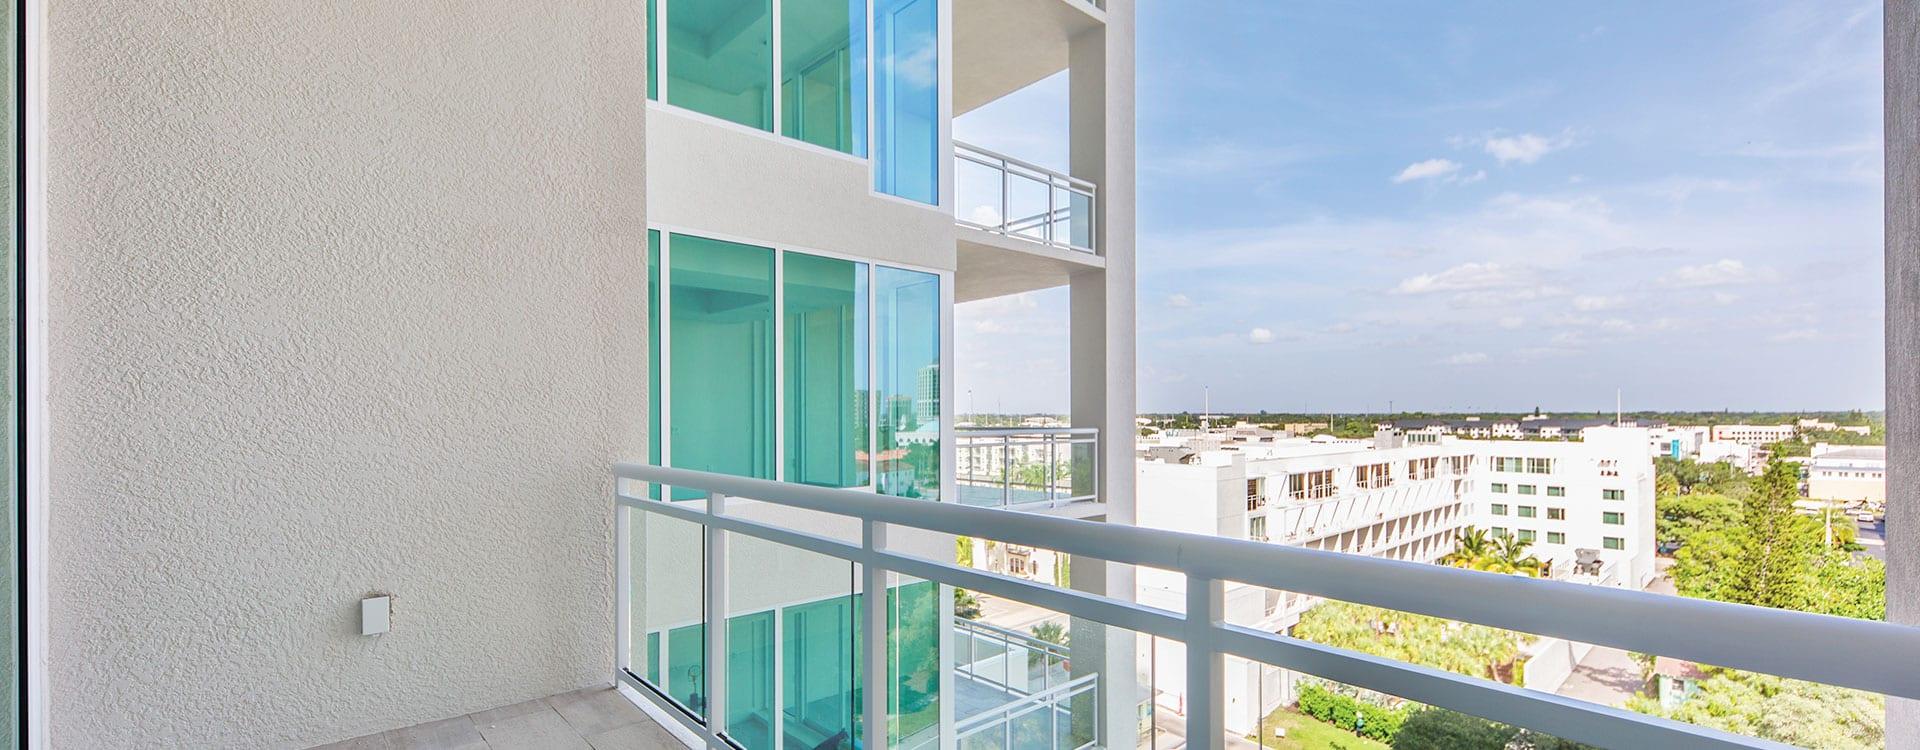 BLVD Sarasota Residence 803 Terrace View